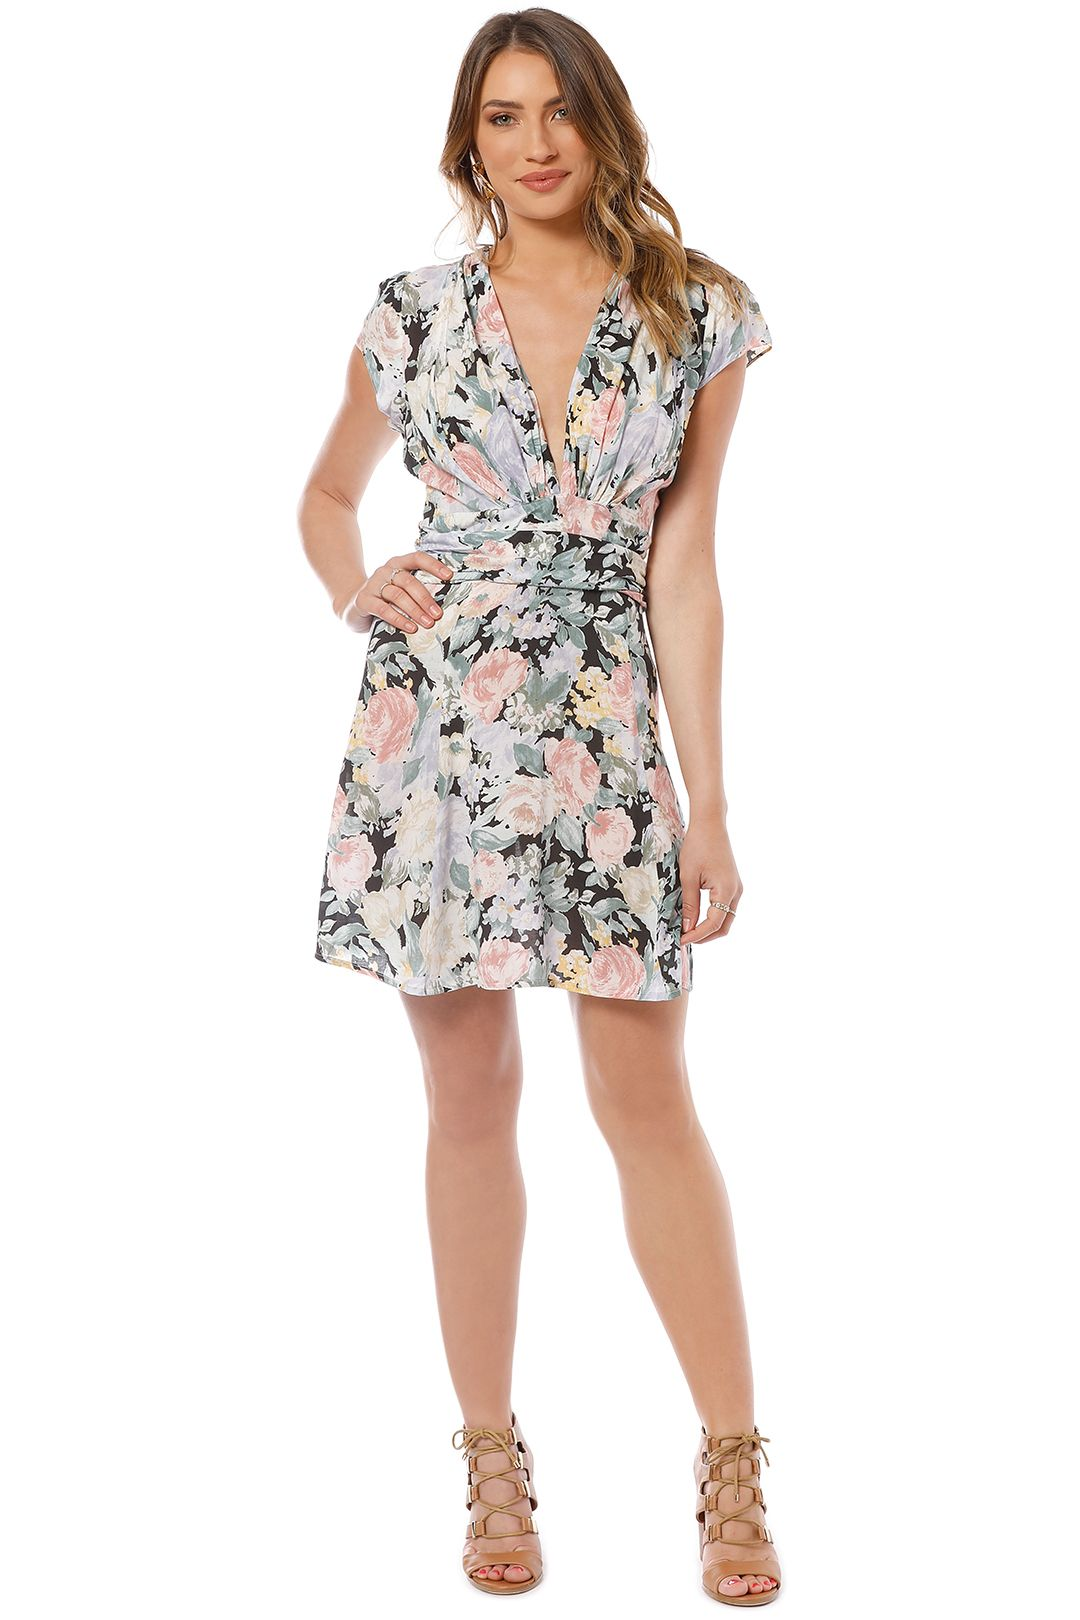 Auguste - Gardenia Goldie Mini Dress - Floral - Front